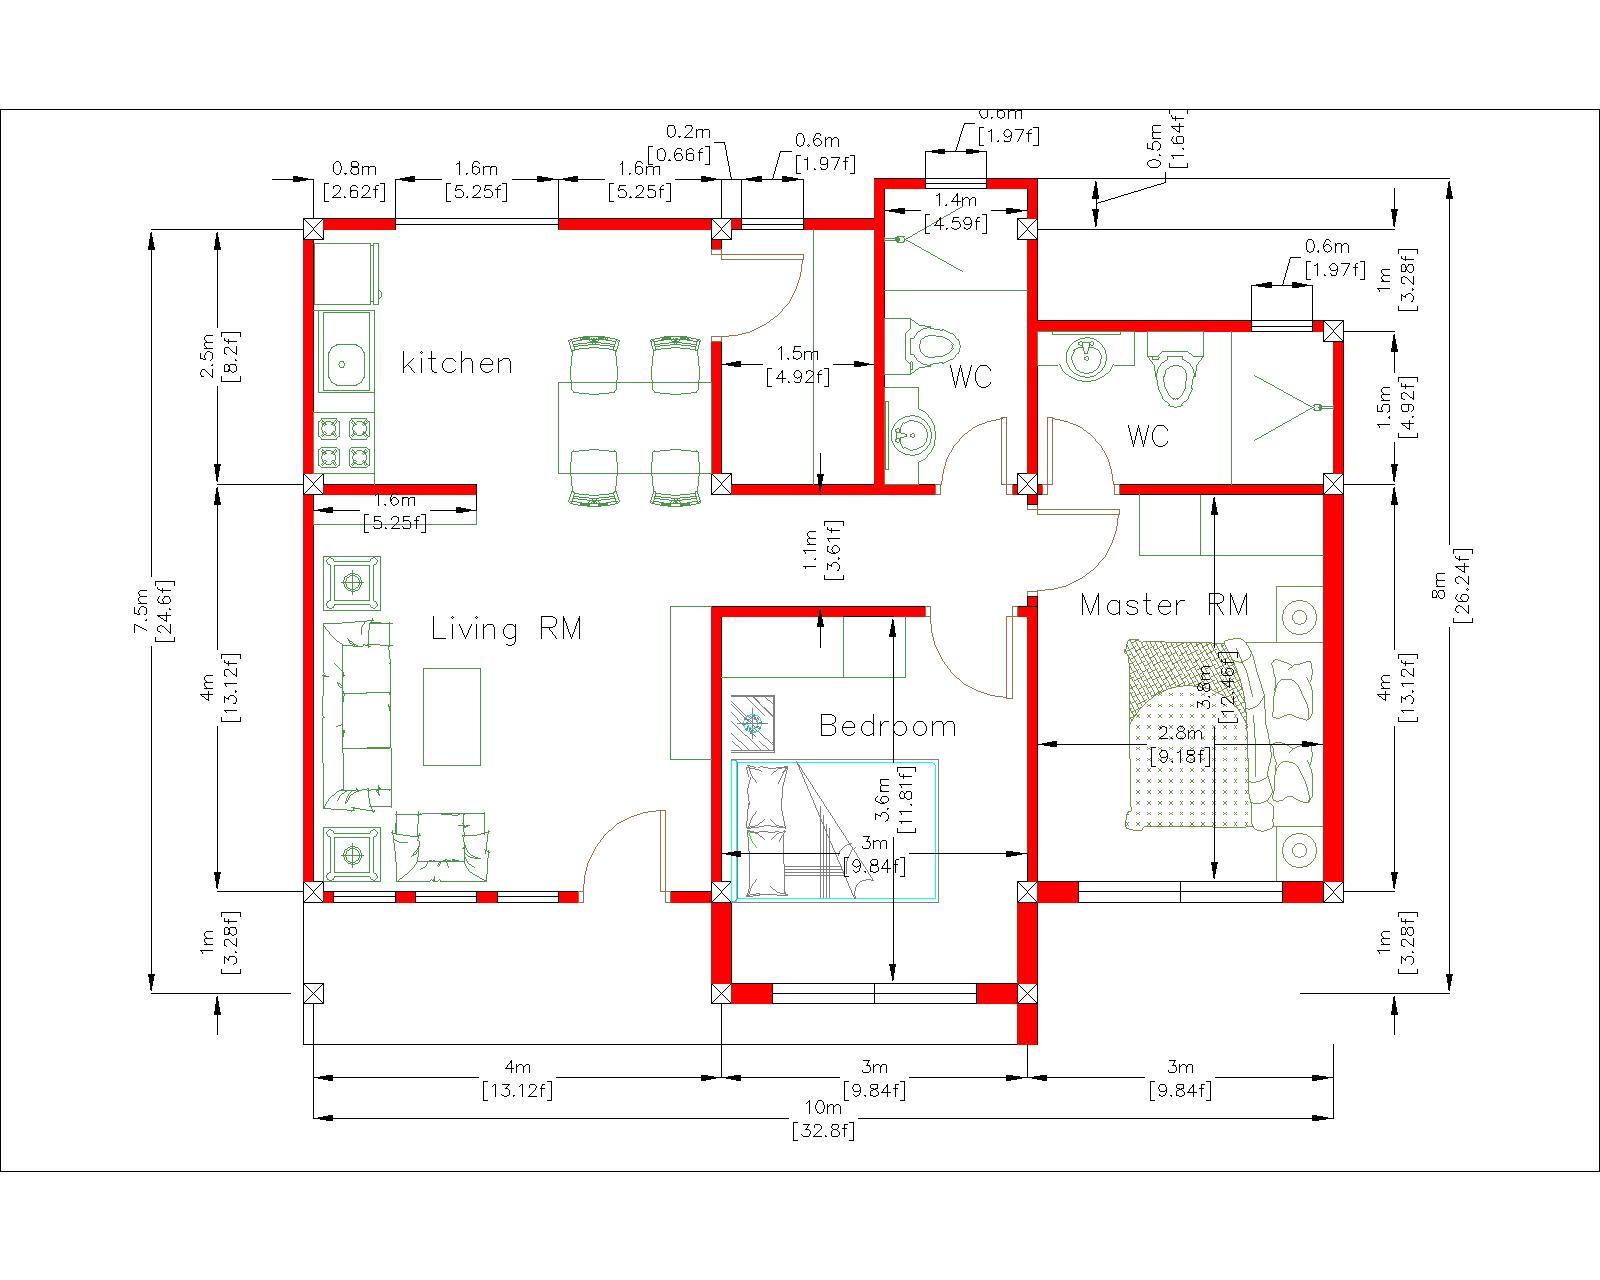 Simple House Design 10x8 Meter 27x34 Feet 3 Beds layout floor plan